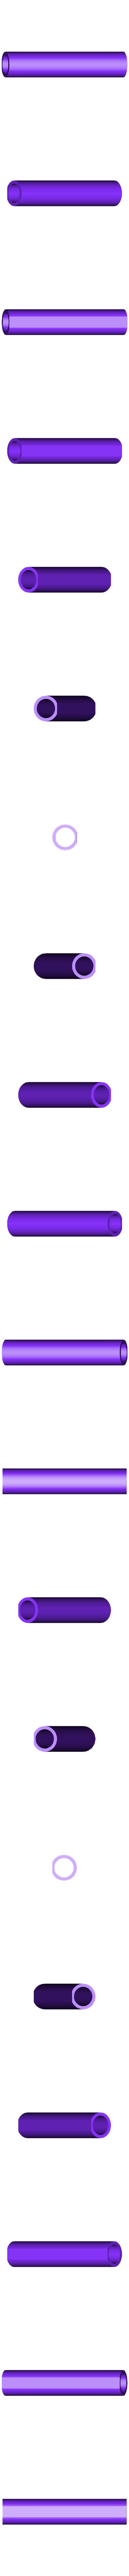 Barrell_Top_Back.stl Télécharger fichier STL gratuit Borderlands Bandit Room Clener Shotgun • Modèle pour impression 3D, Dsk